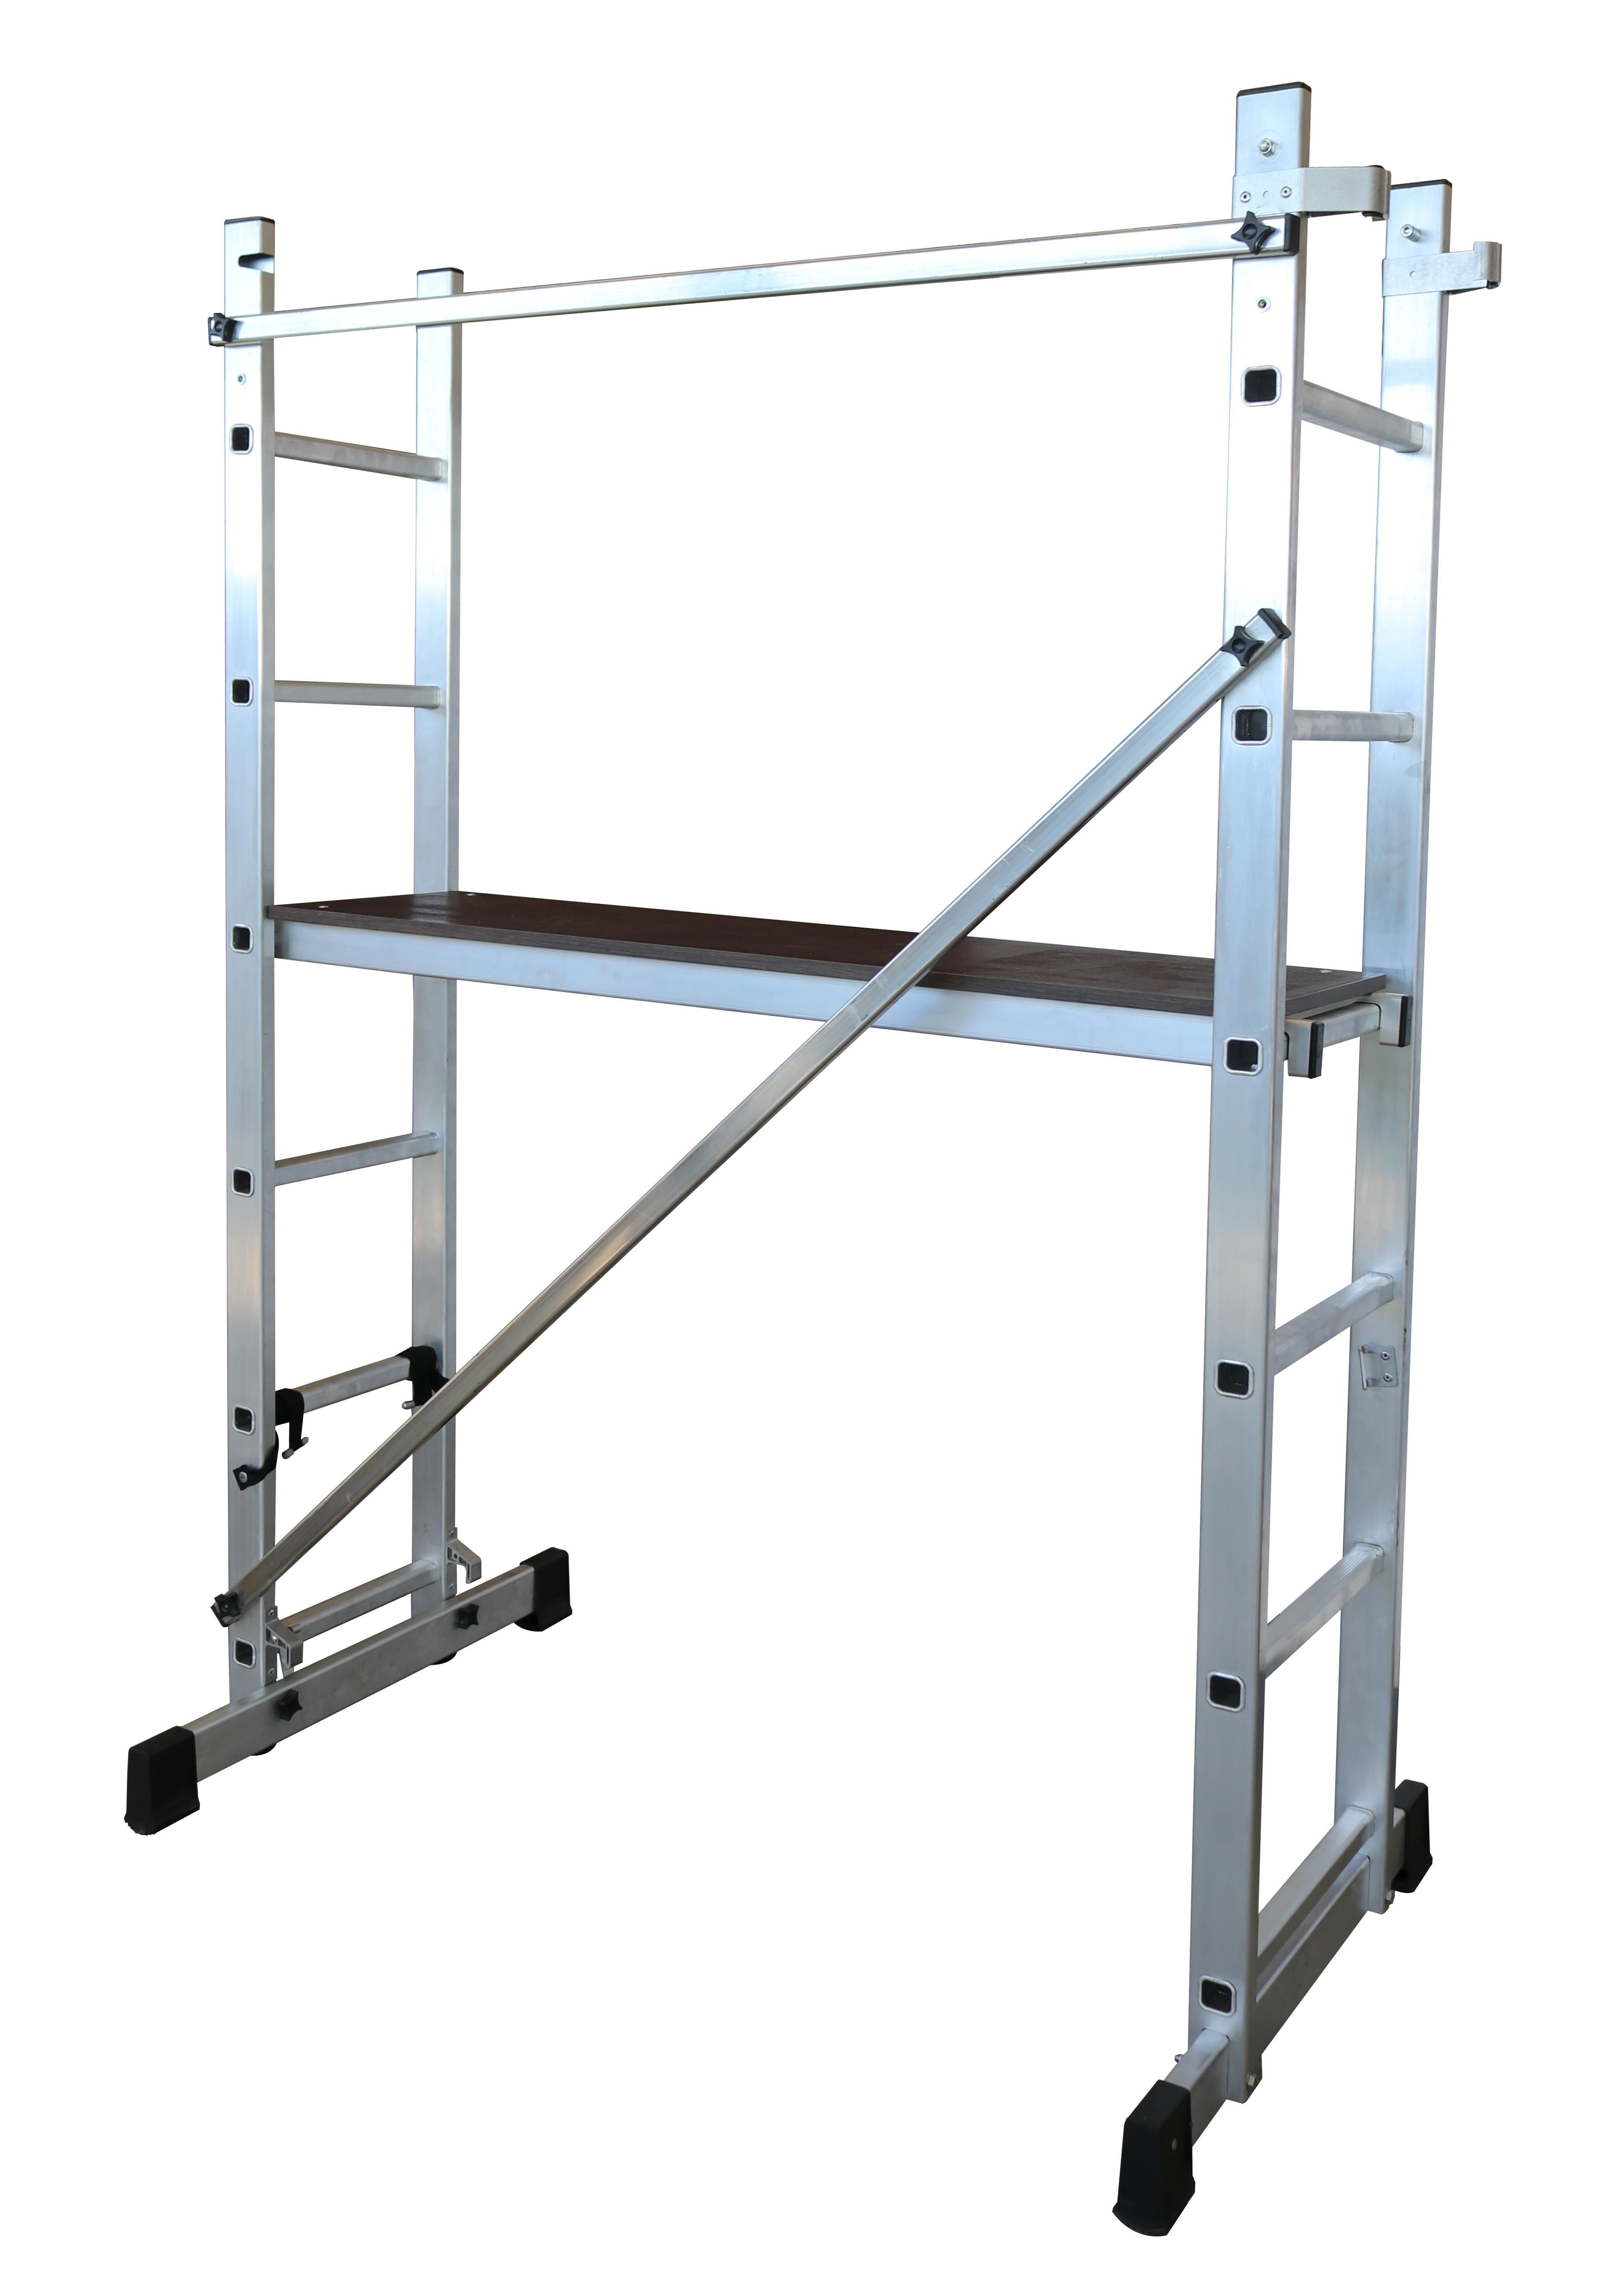 escalera-andamio multiusos Échafaudage-échelle 2 plans escalera andamio 1